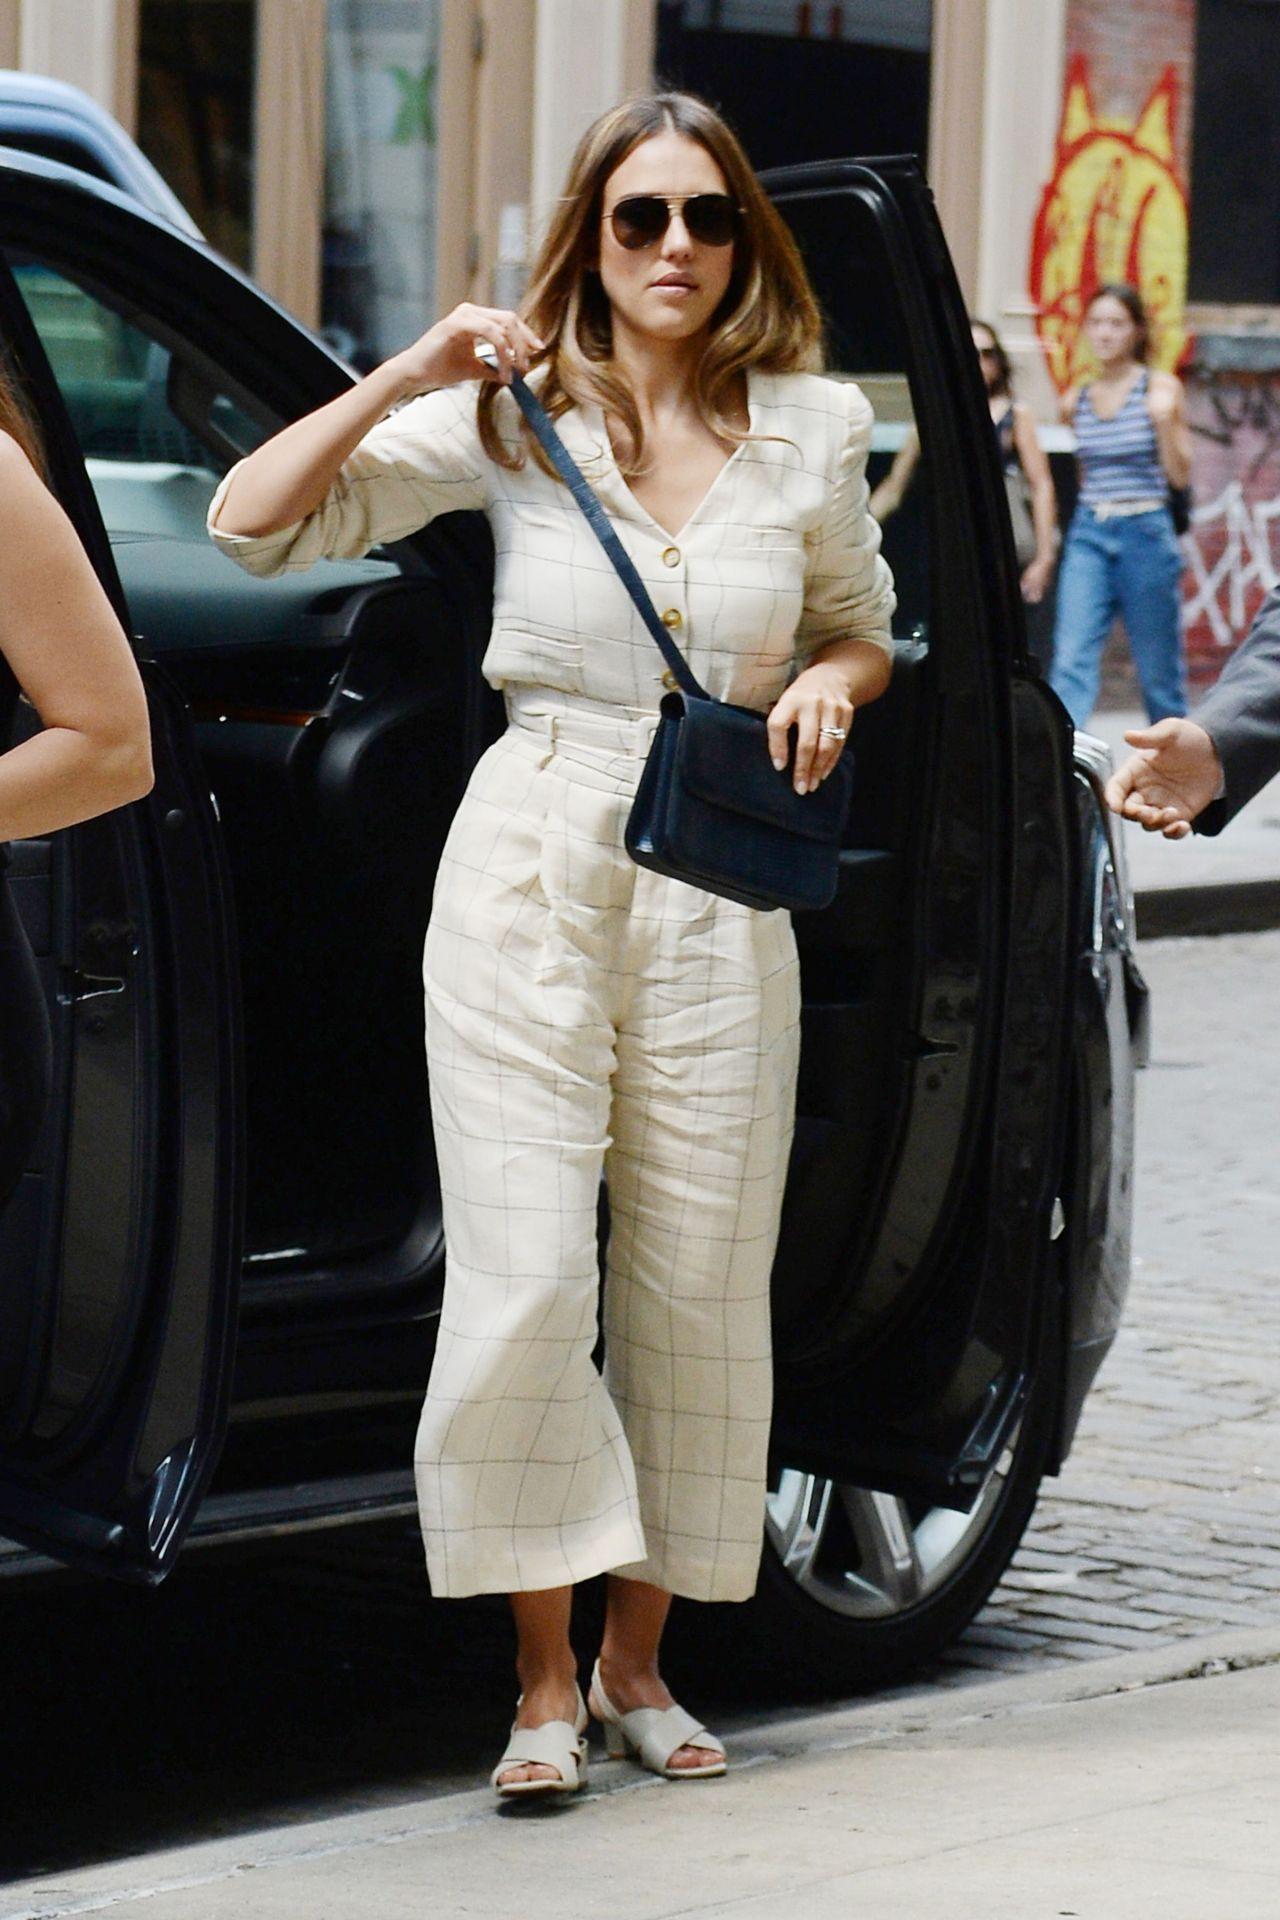 https://celebmafia.com/wp-content/uploads/2018/08/jessica-alba-is-stylish-leaving-people-live-in-nyc-9.jpg